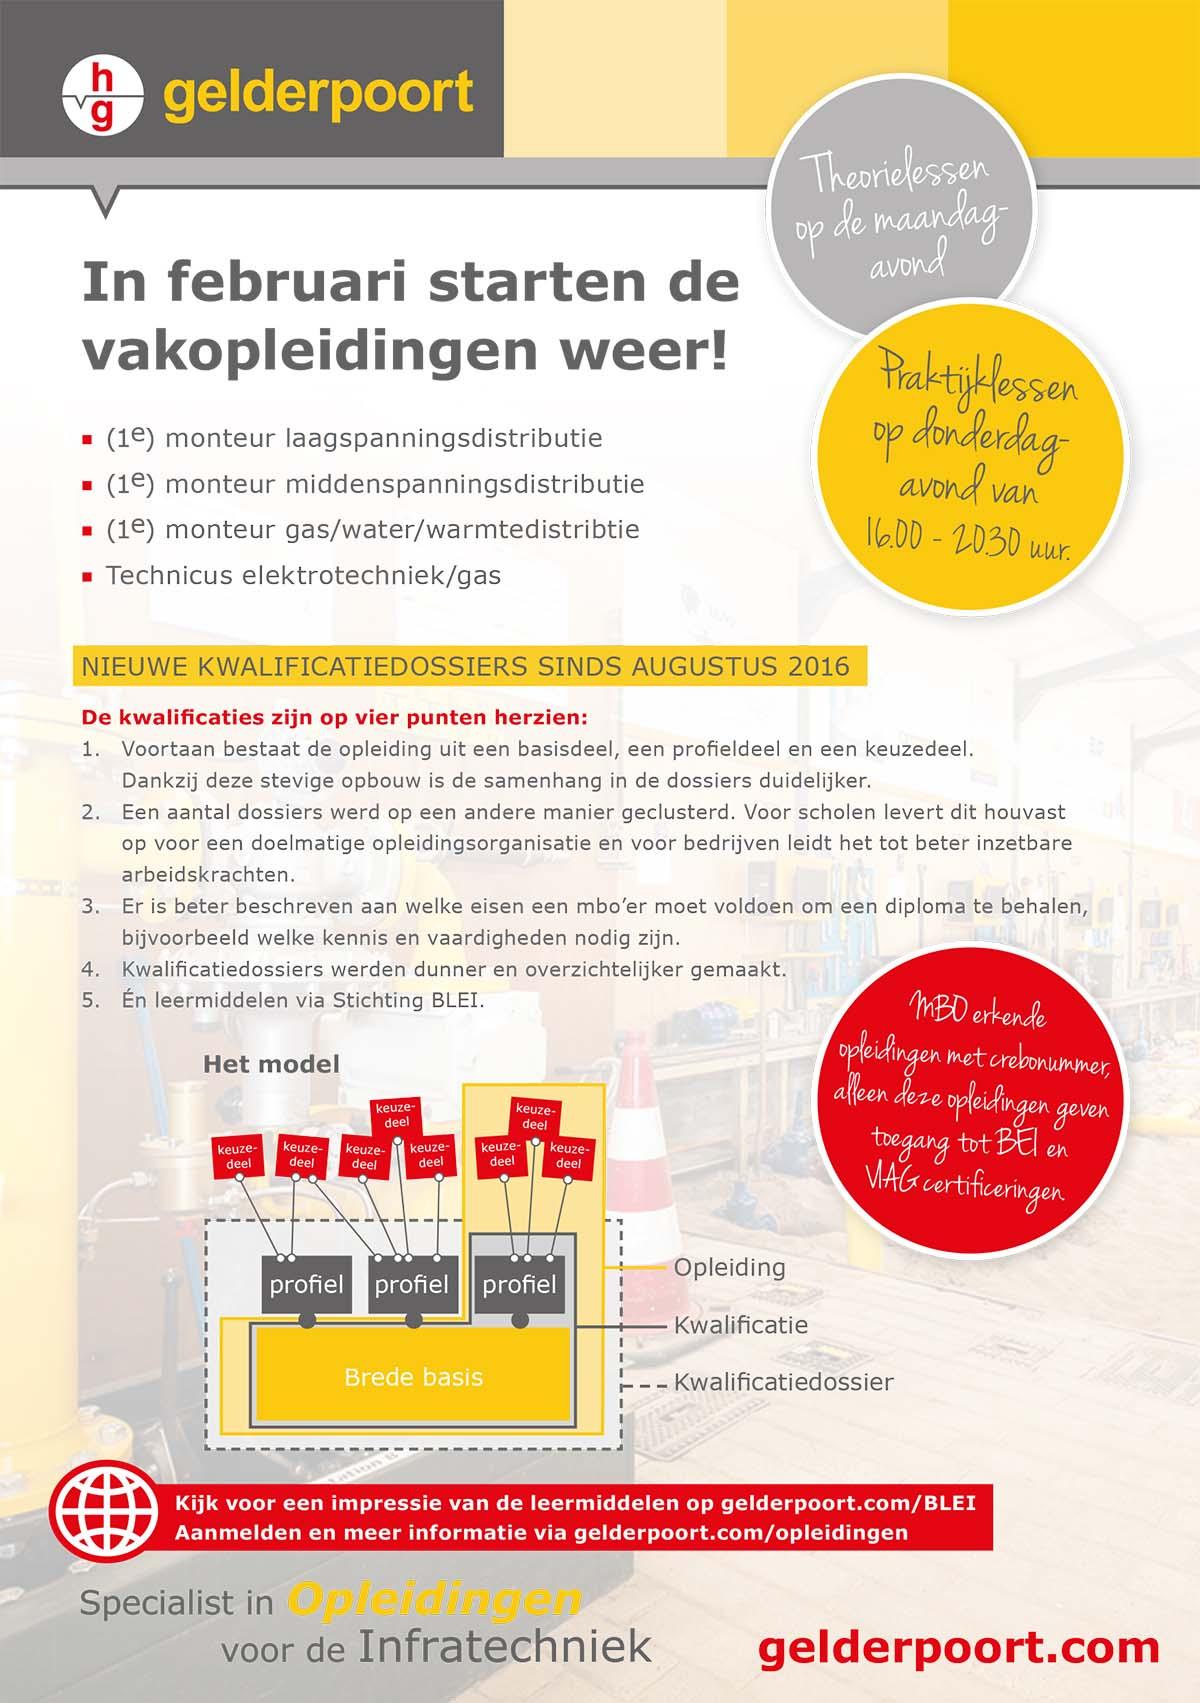 start-vakopleiding-februari